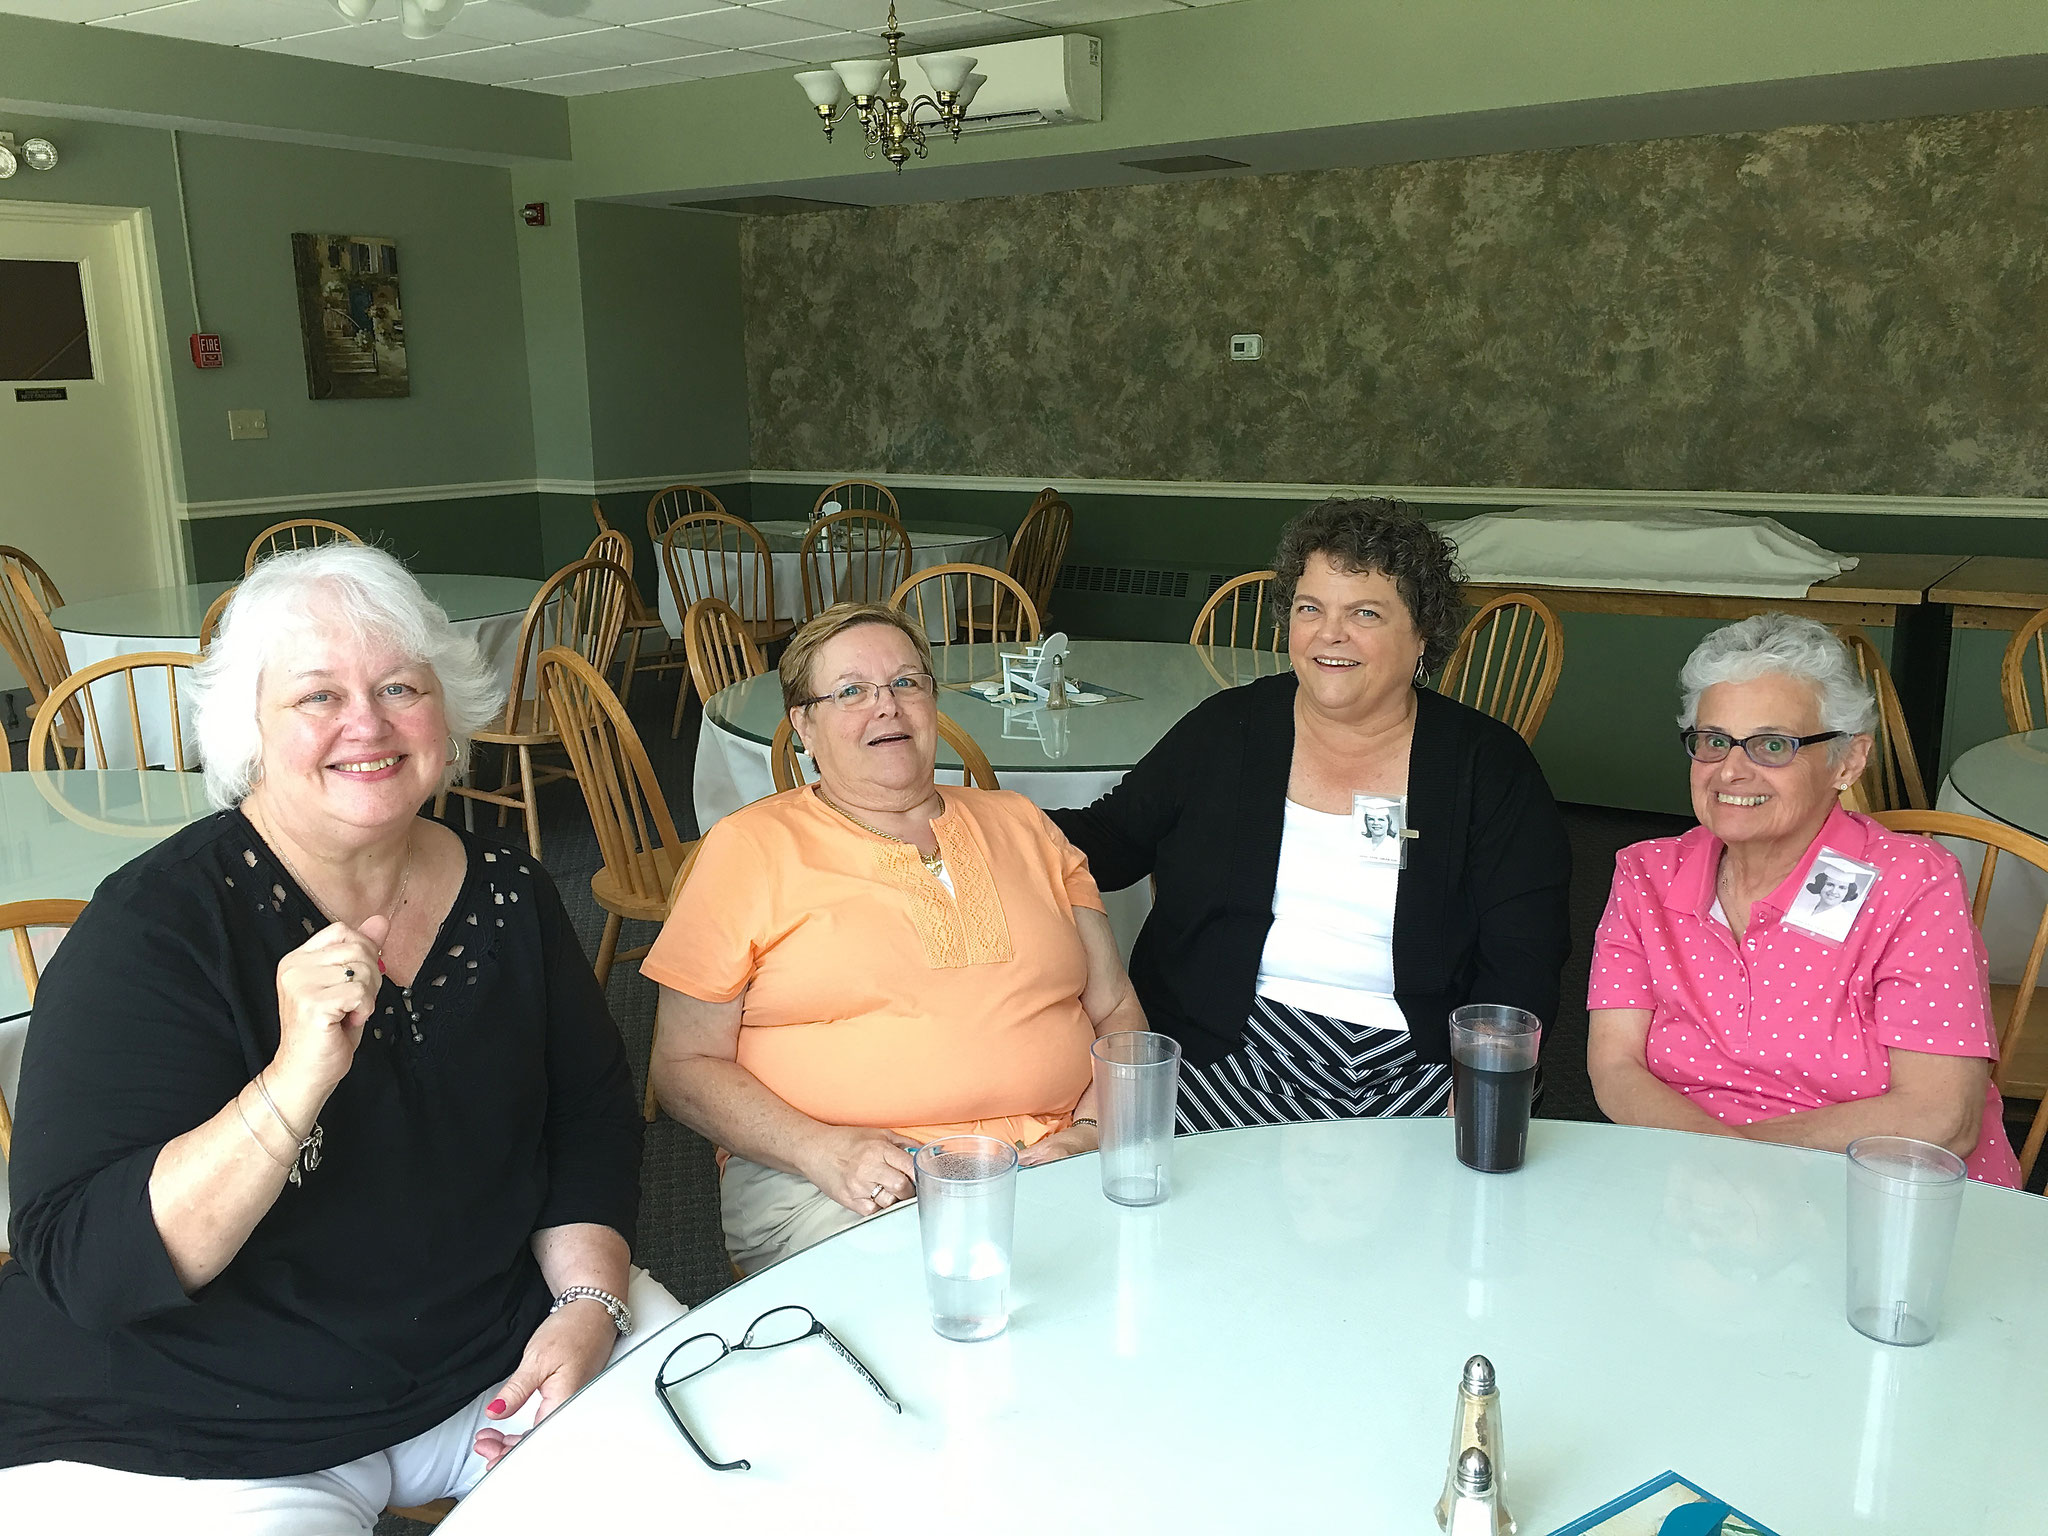 Mary Jane, Diane, Linda Edgerton, Linda Palmisano